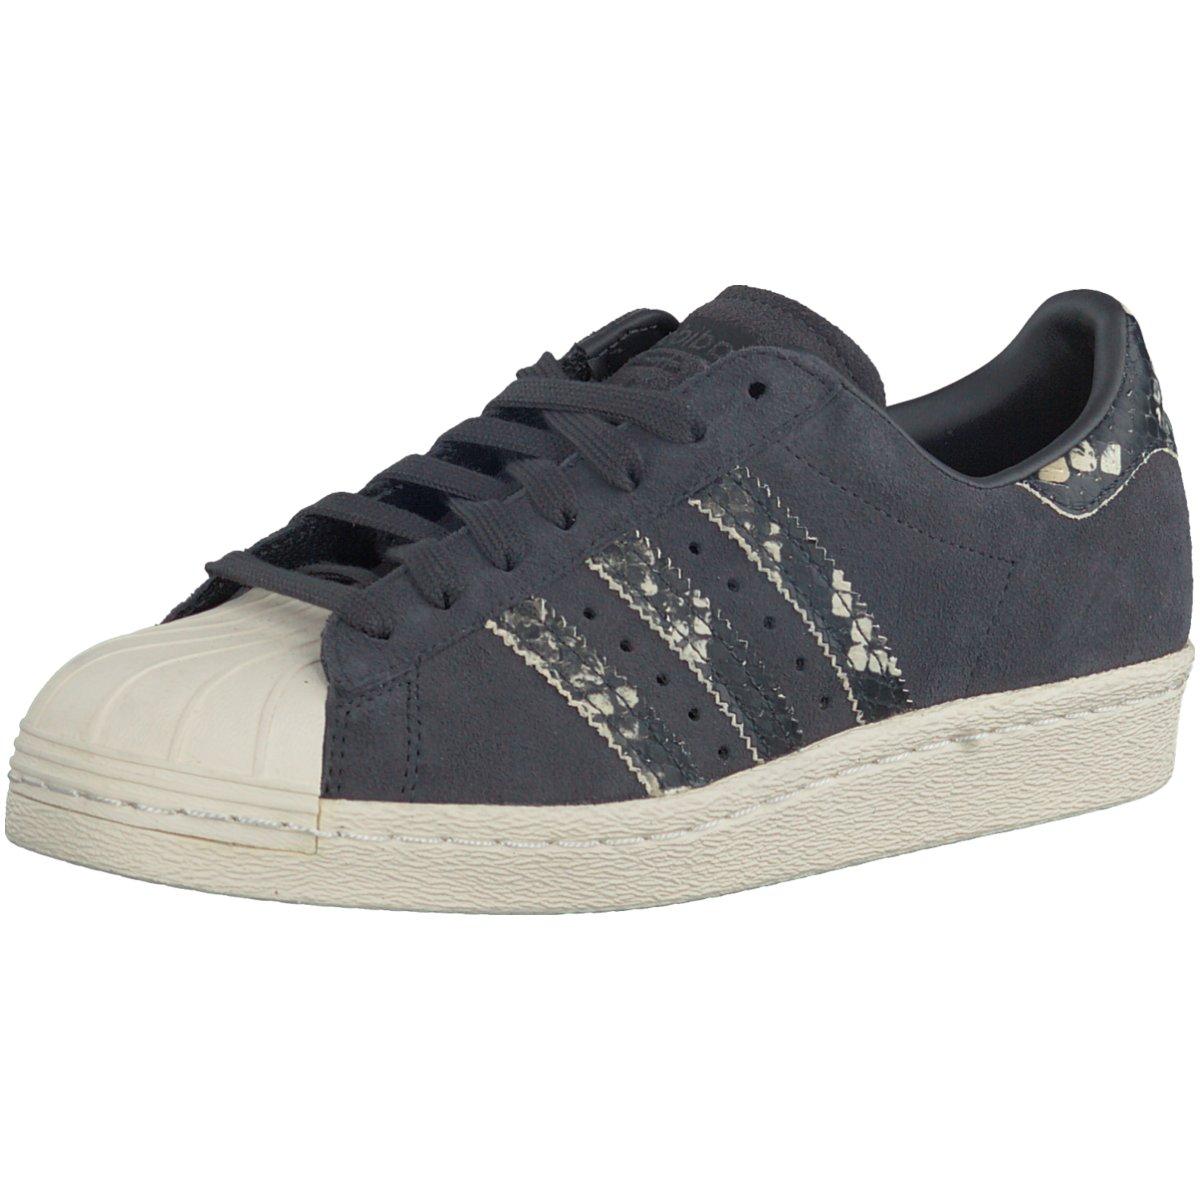 S2K adidas Originals Damen Turnschuhe Superstar 80s W Damen Turnschuhe anthrazit